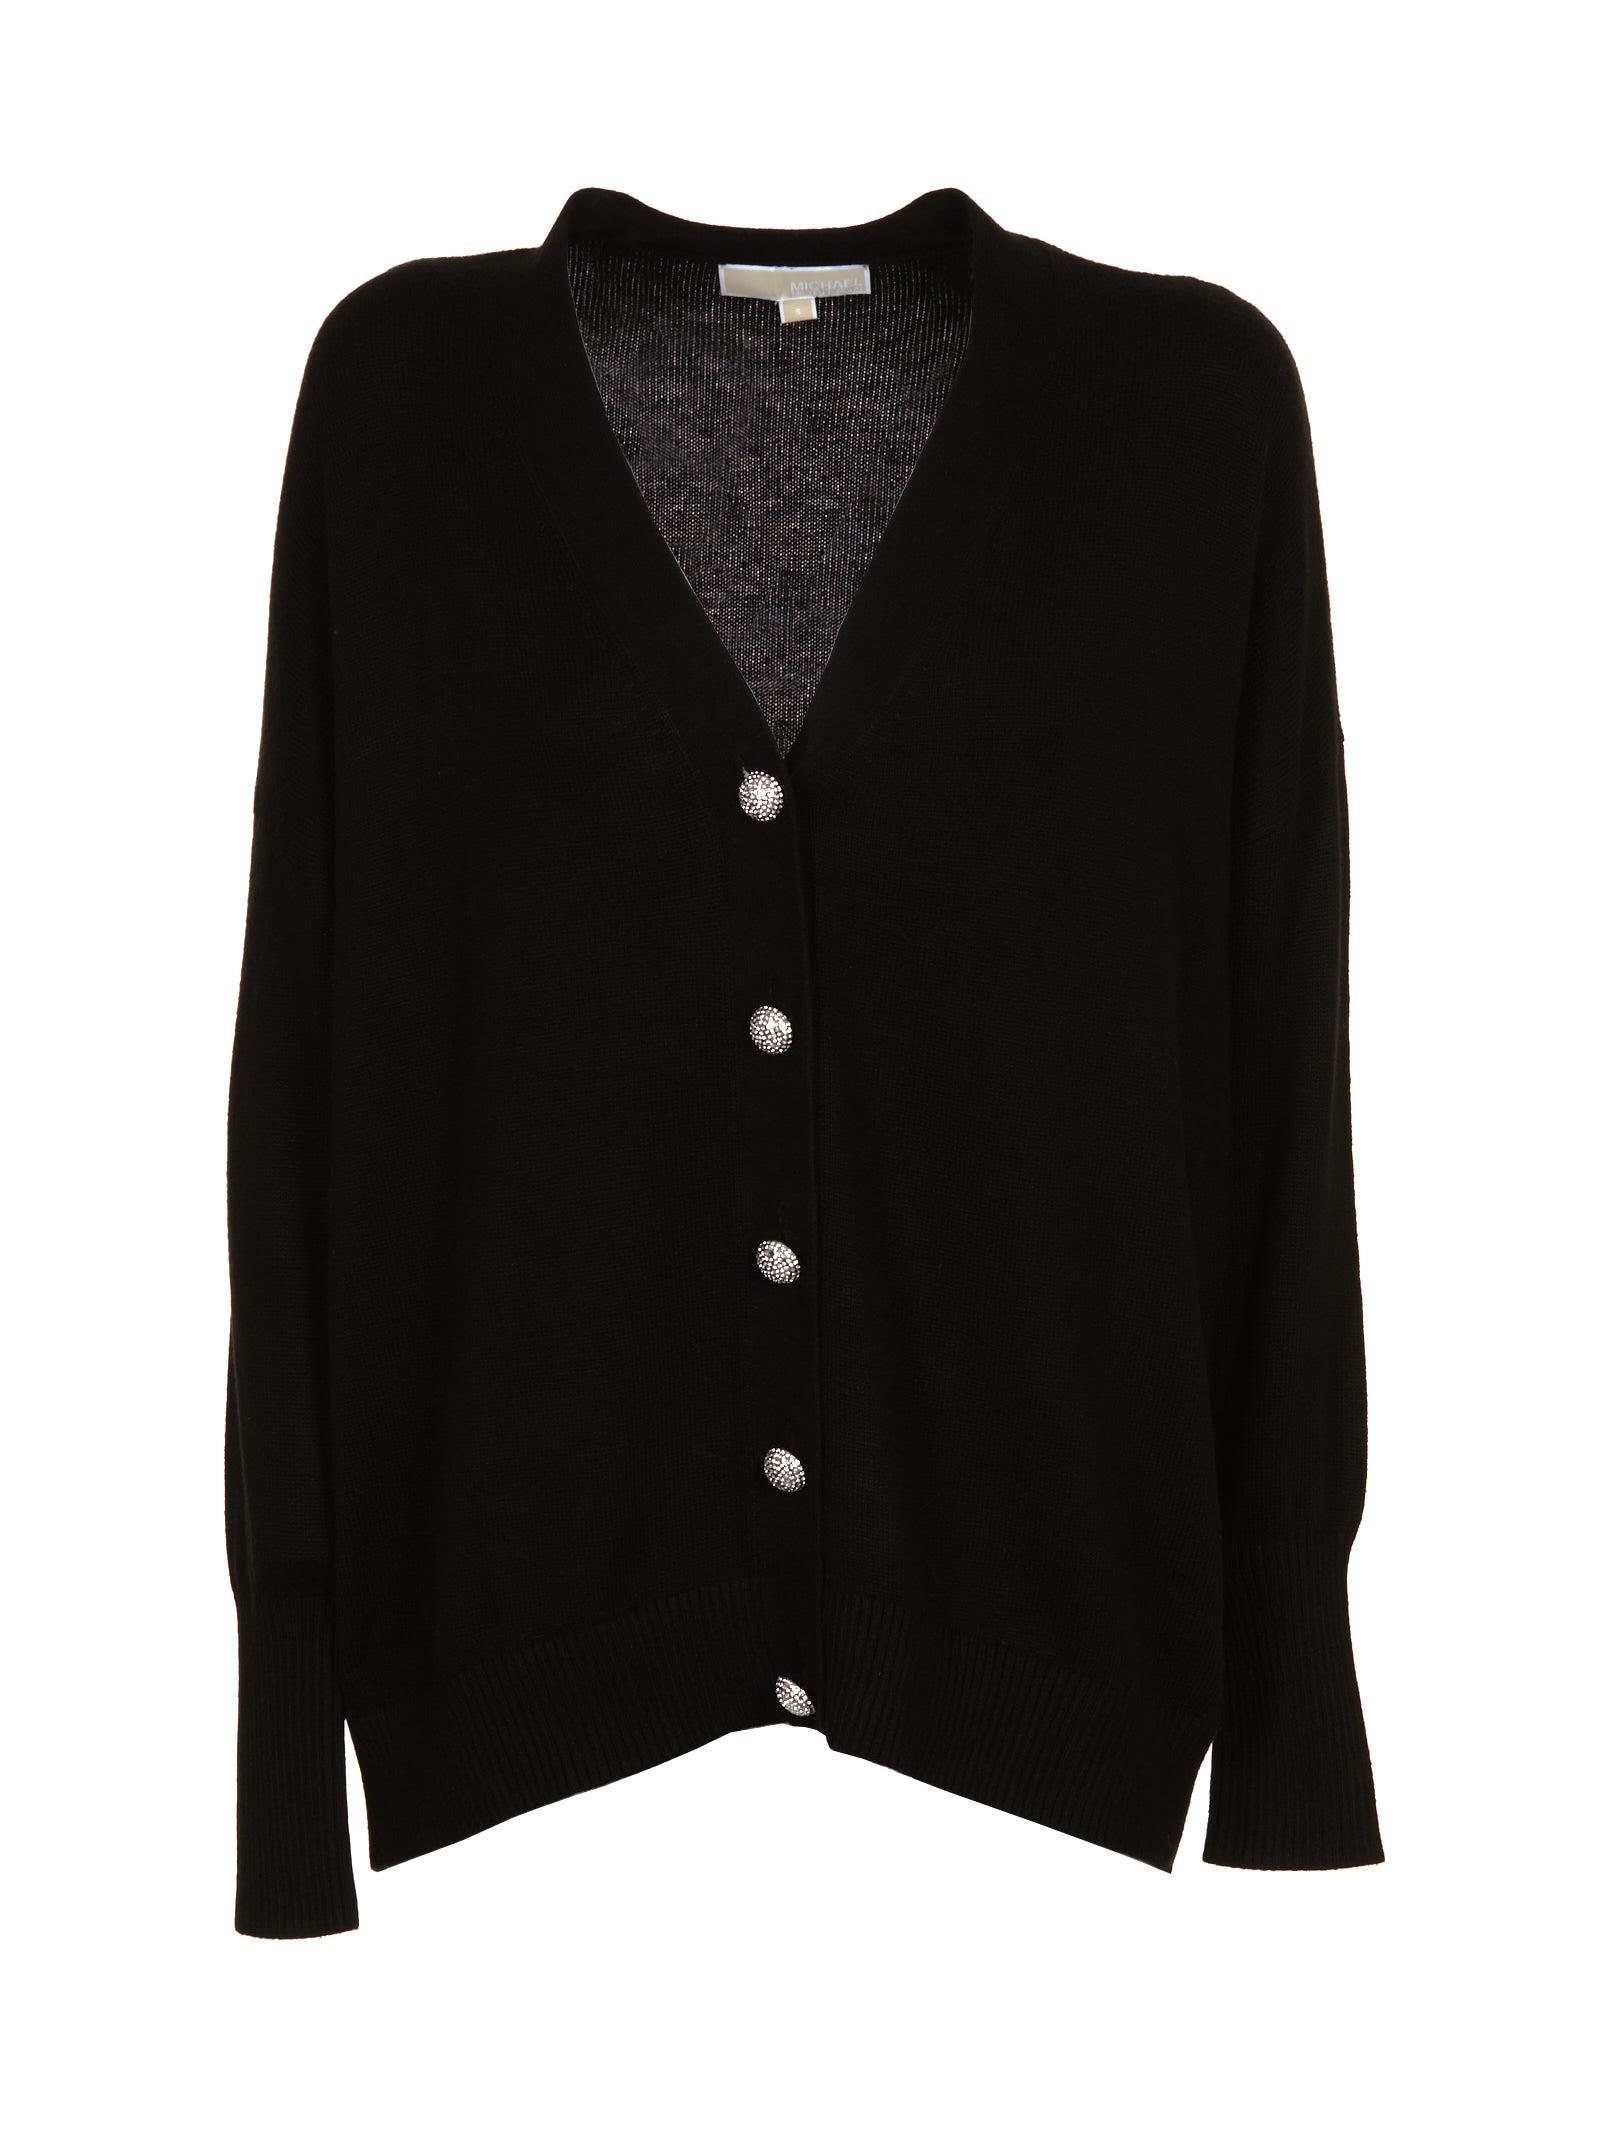 Michael Kors Button Cardigan